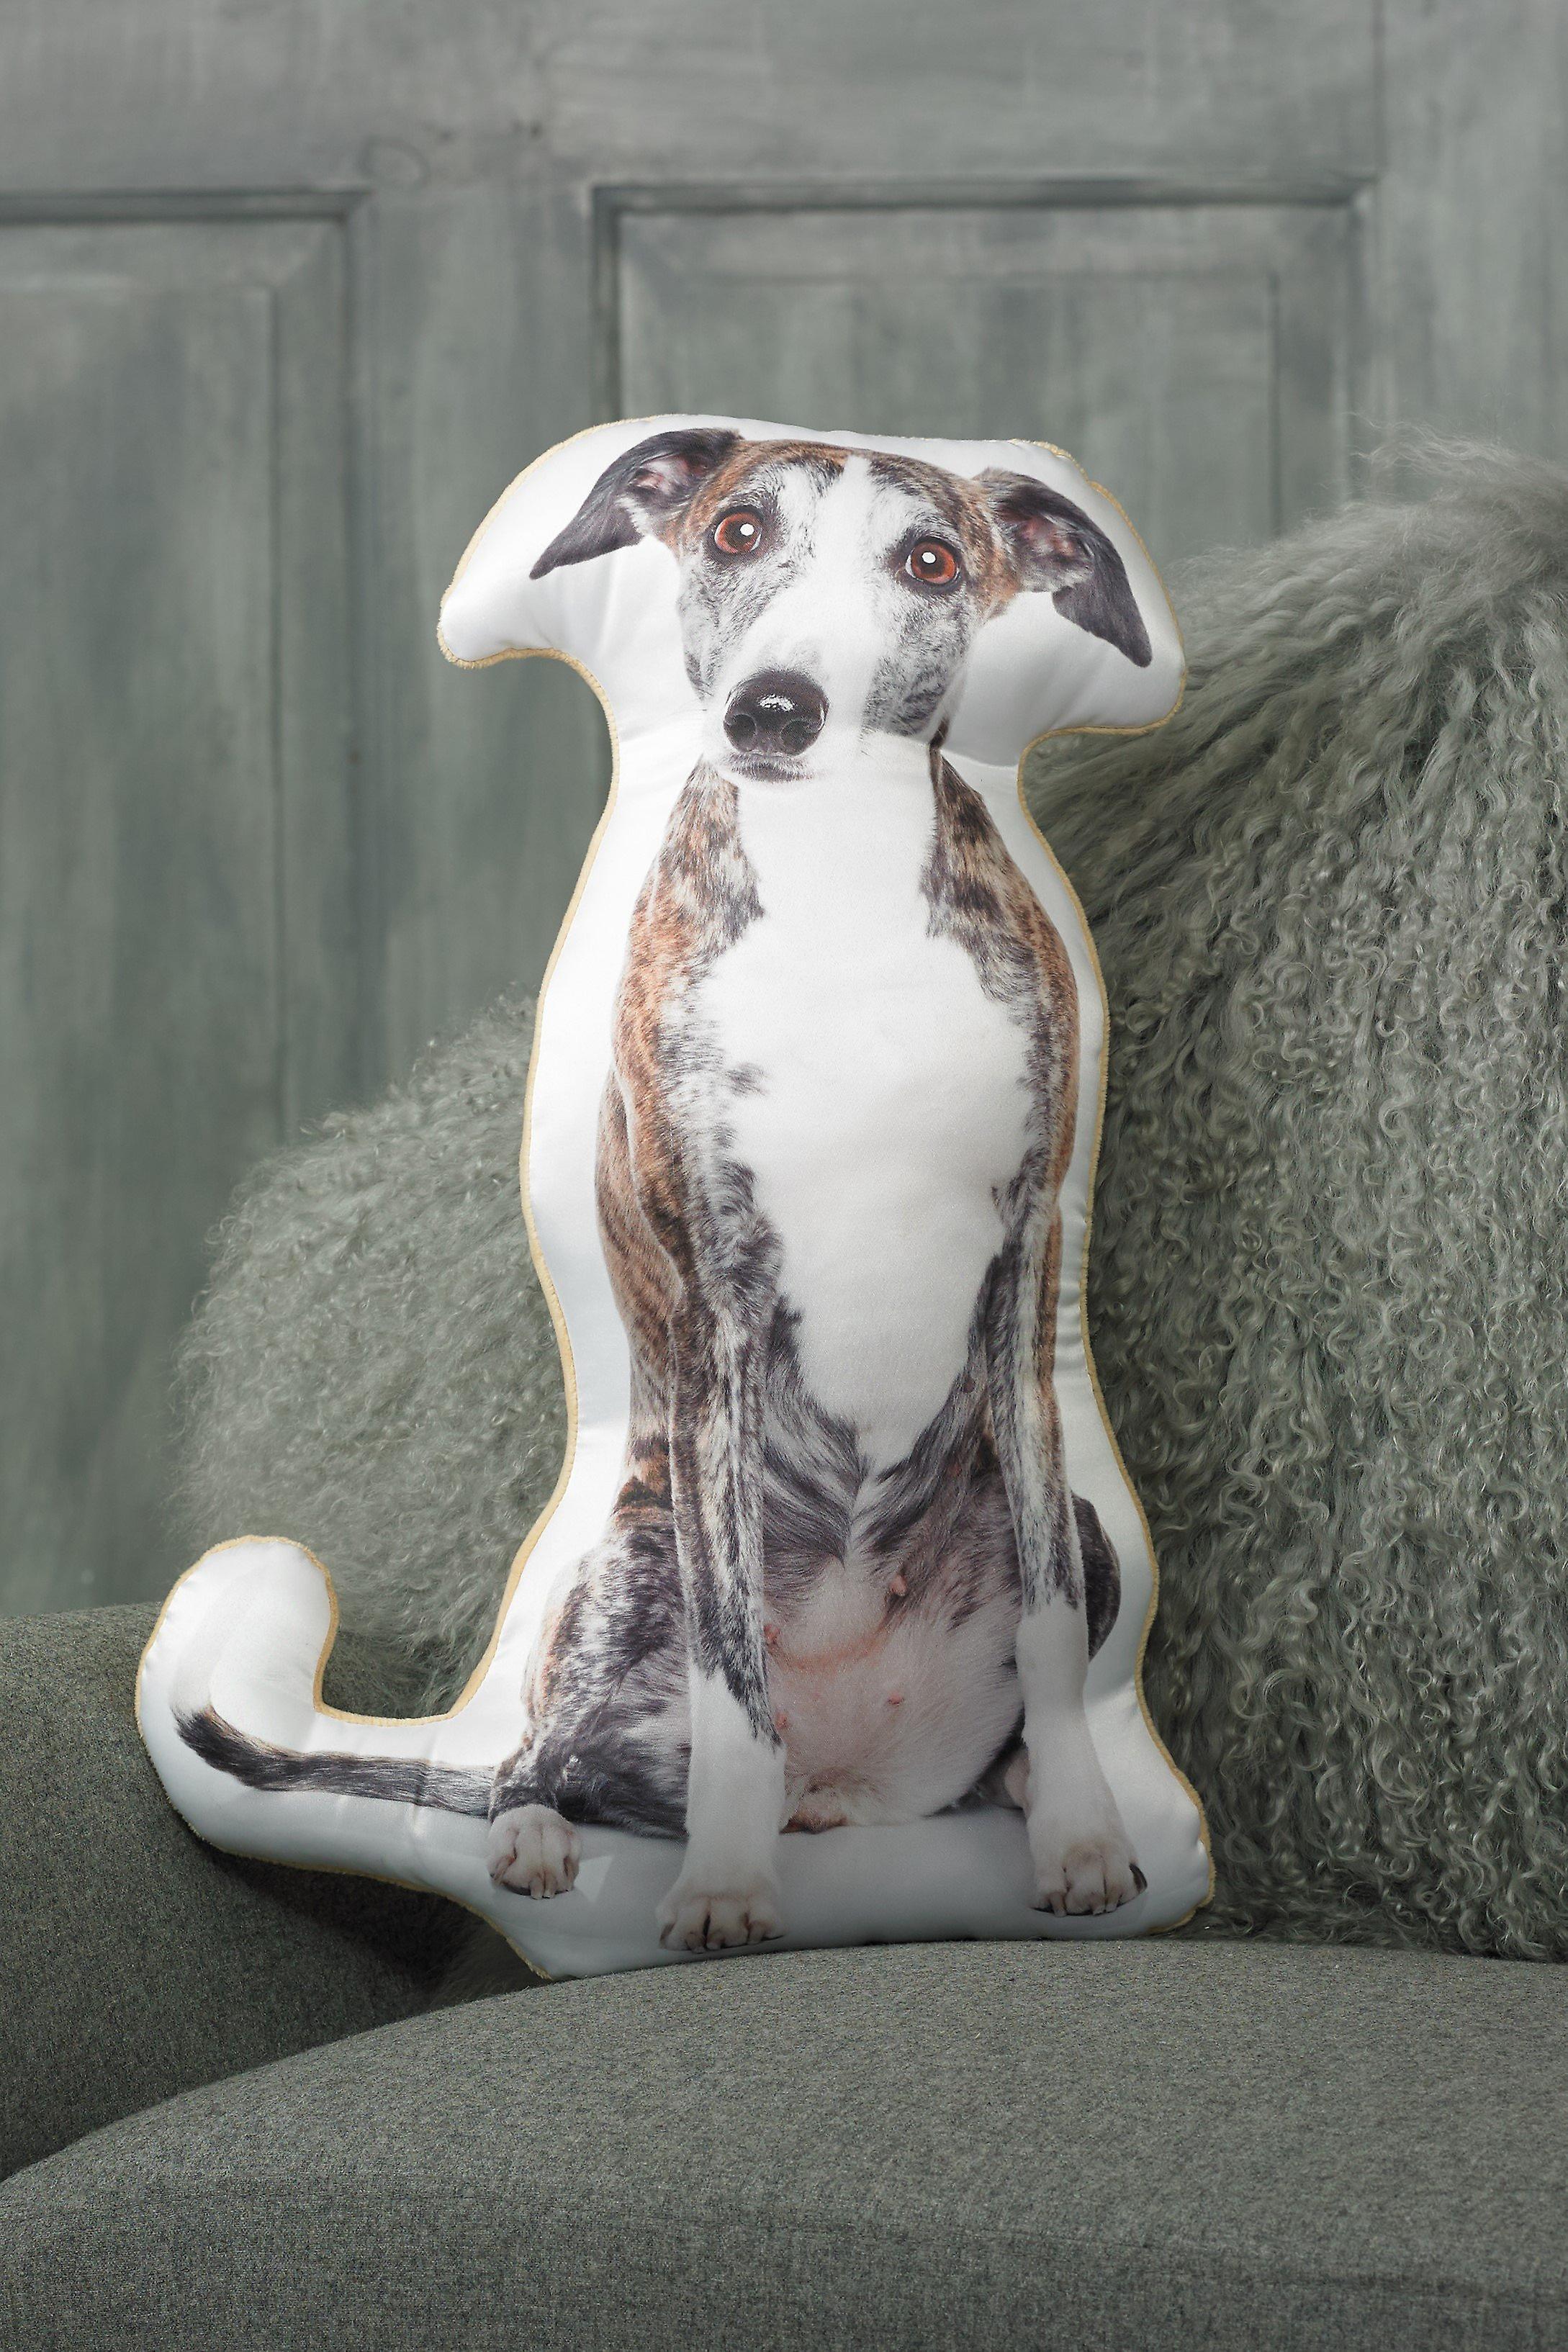 Adorable greyhound shaped cushion